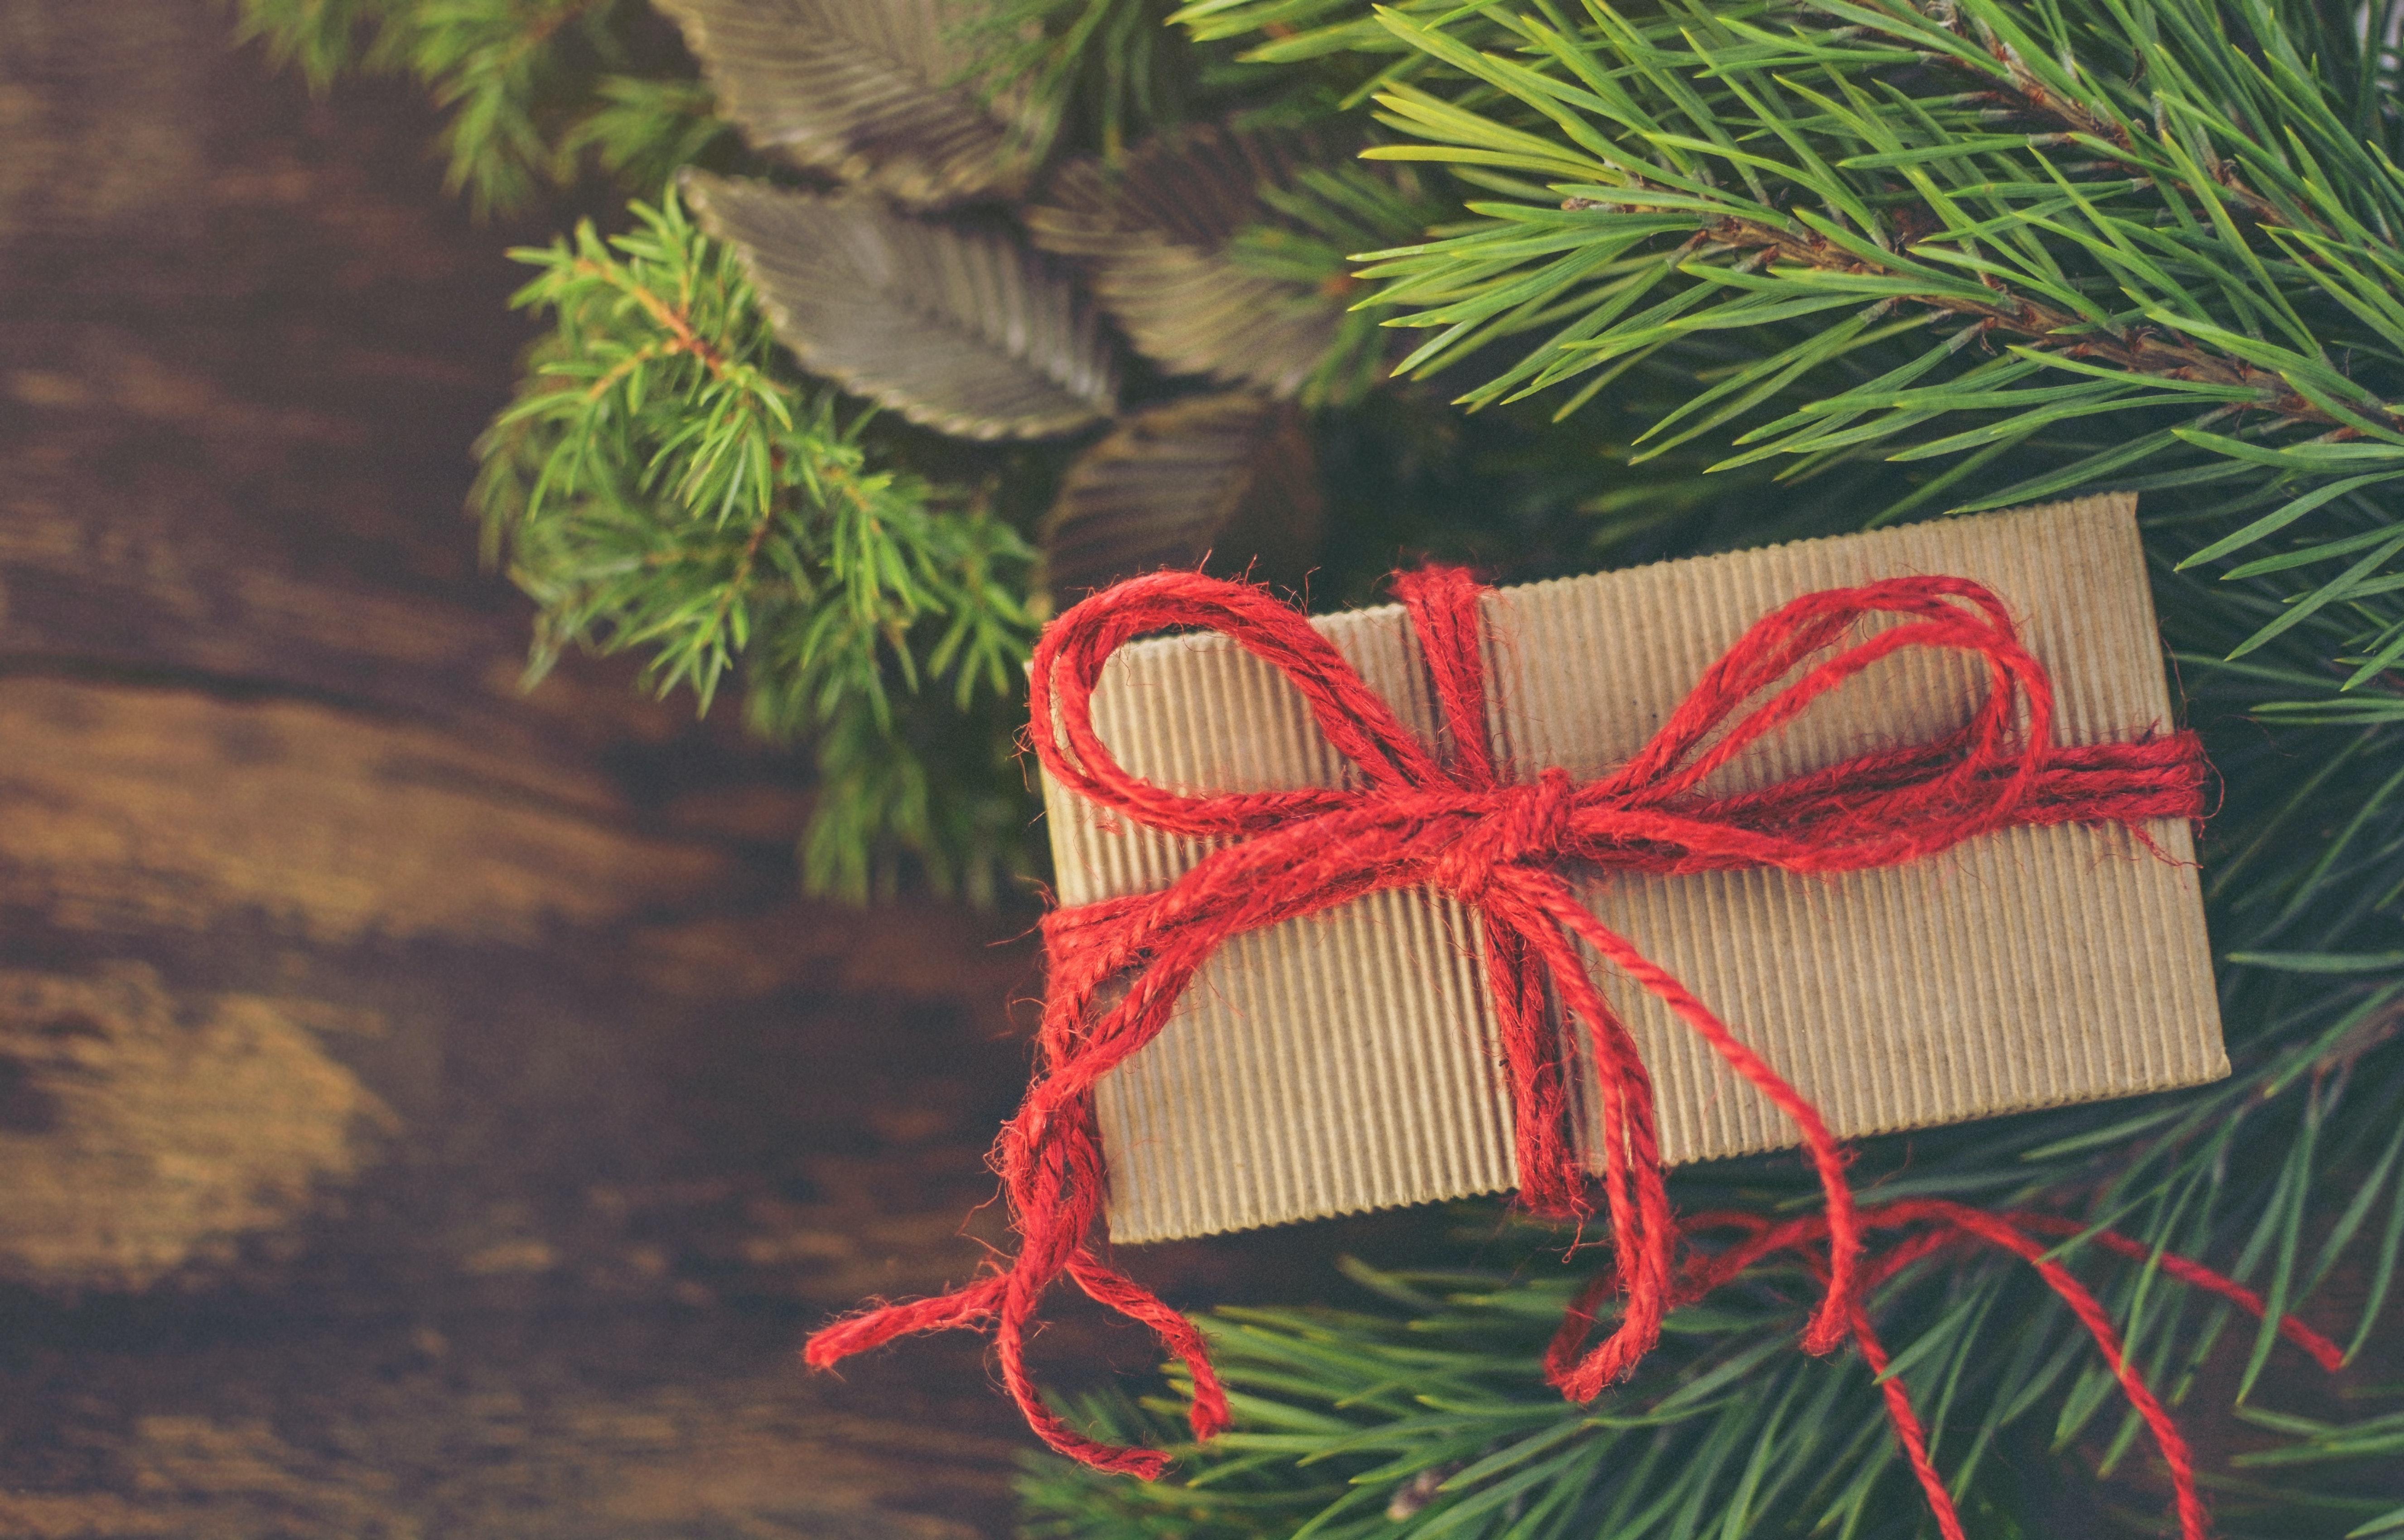 Gift Giving Tips for The Holiday Season